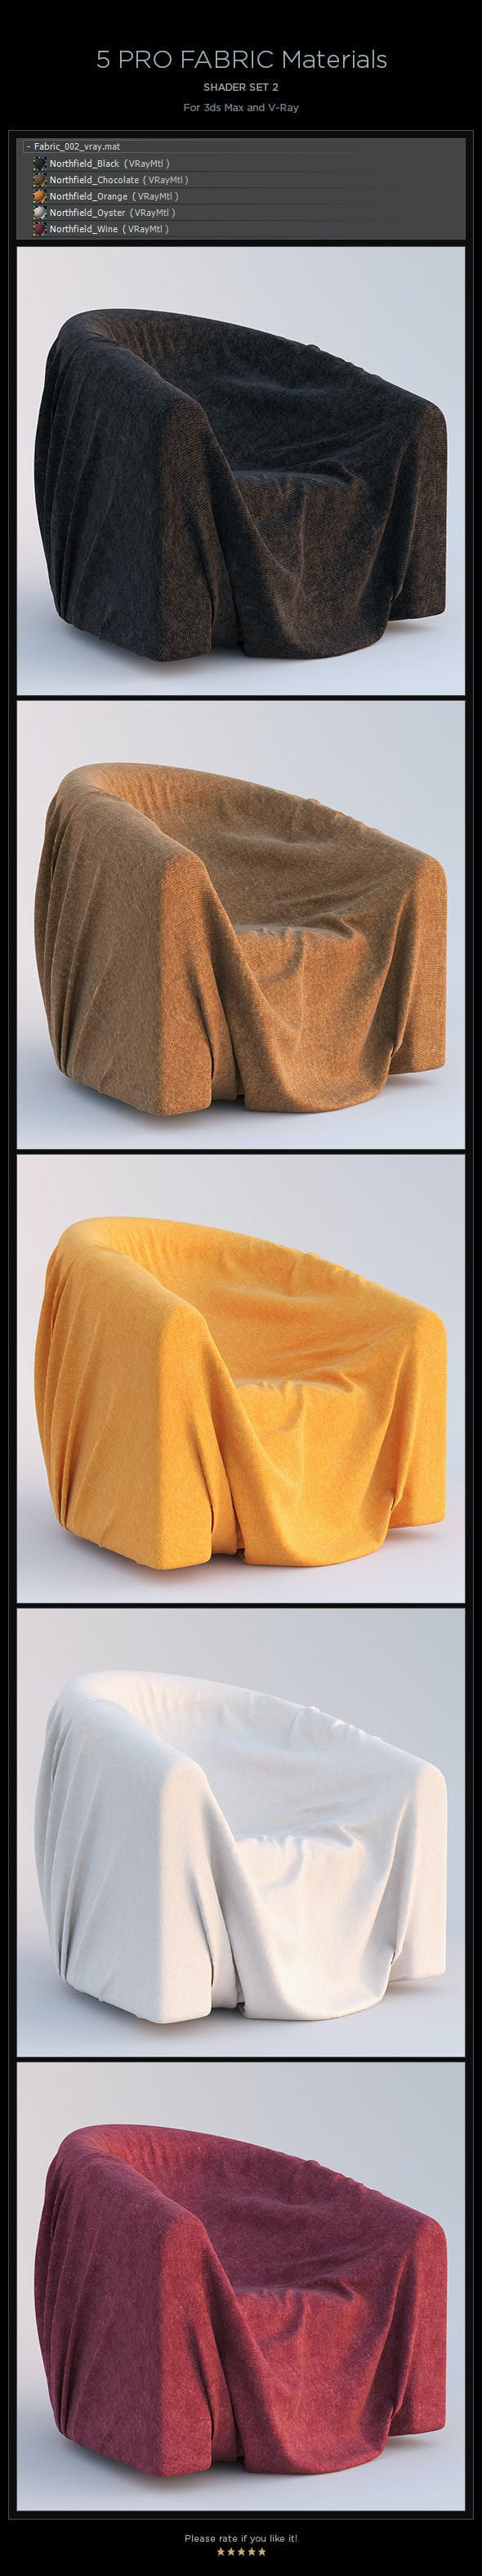 5 Pro Fabric Materials - set 2 - 3DOcean Item for Sale